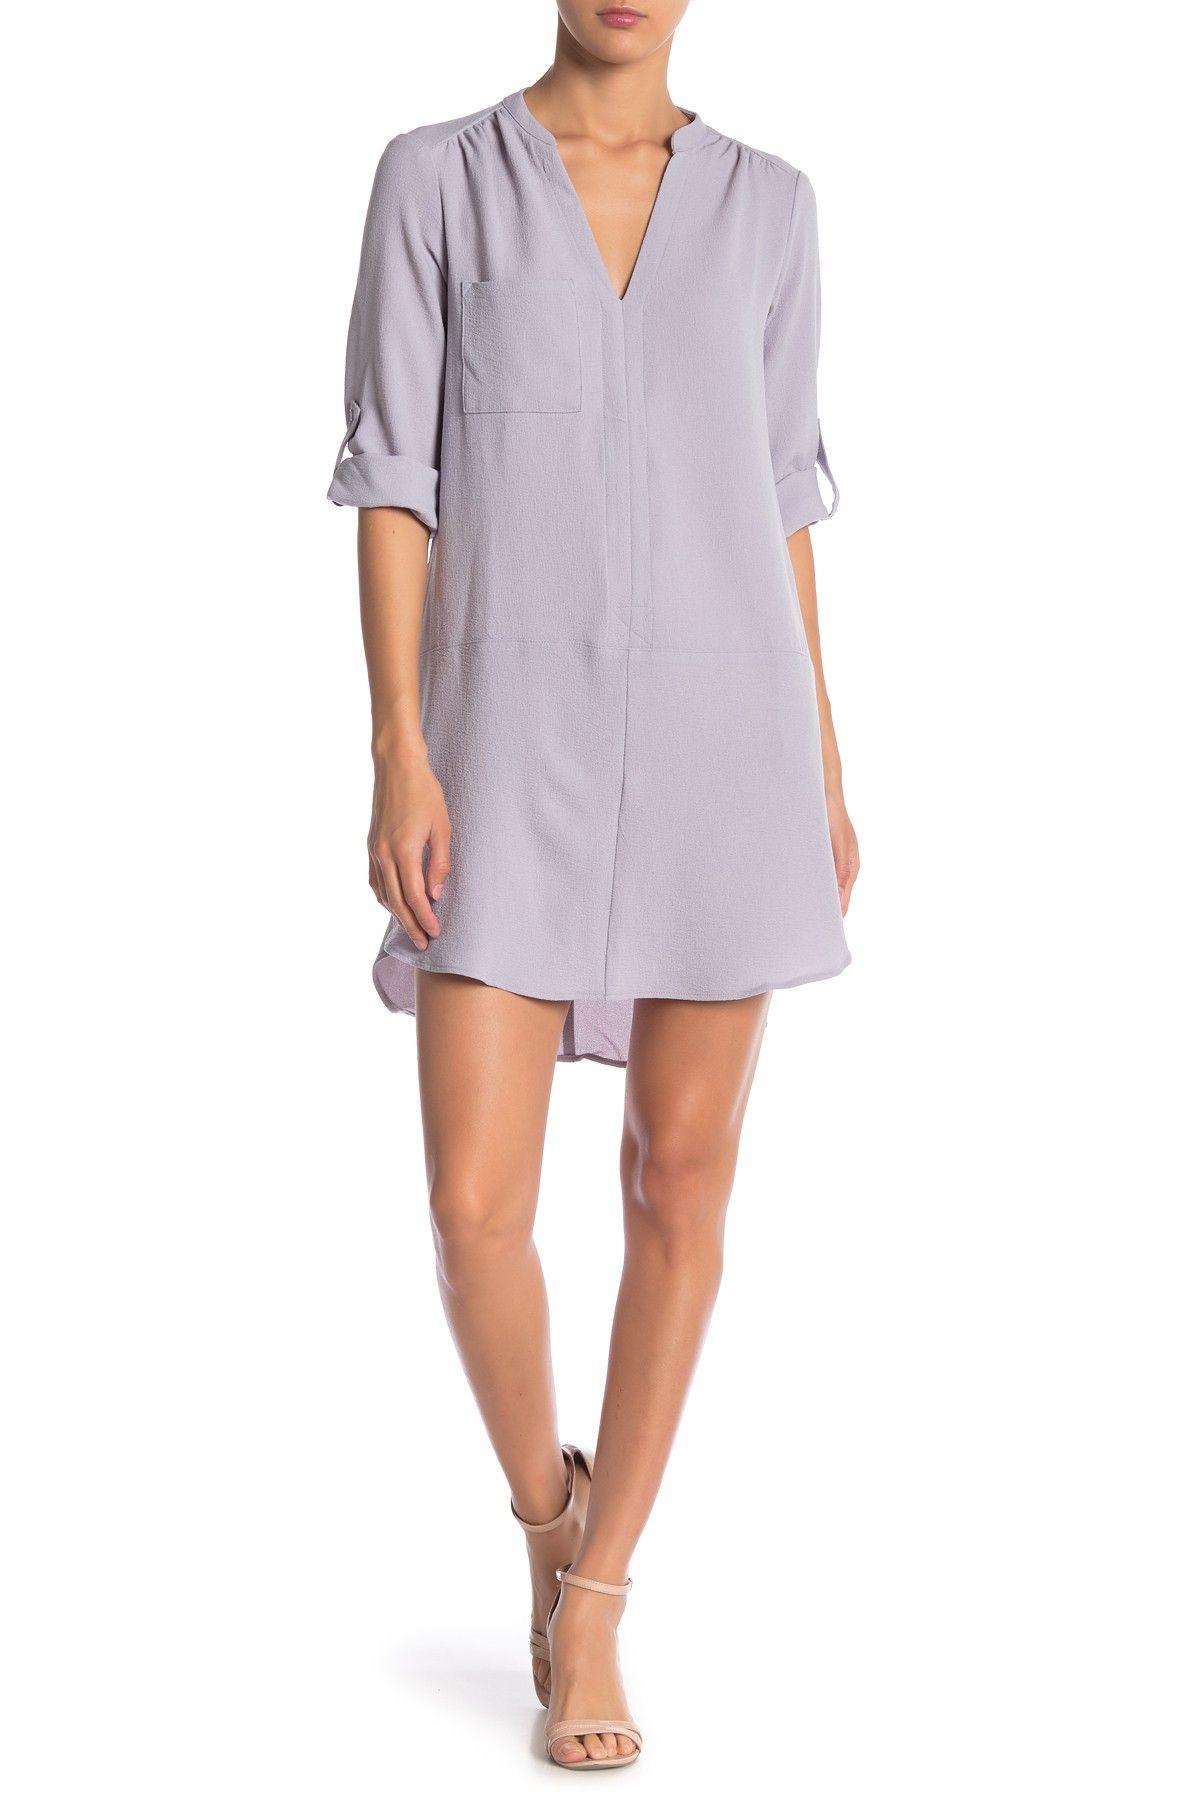 Lush Novak 3 4 Sleeve Shift Dress Nordstrom Rack Classic Shirt Dress Clothes Clearance Clothes [ 1800 x 1200 Pixel ]